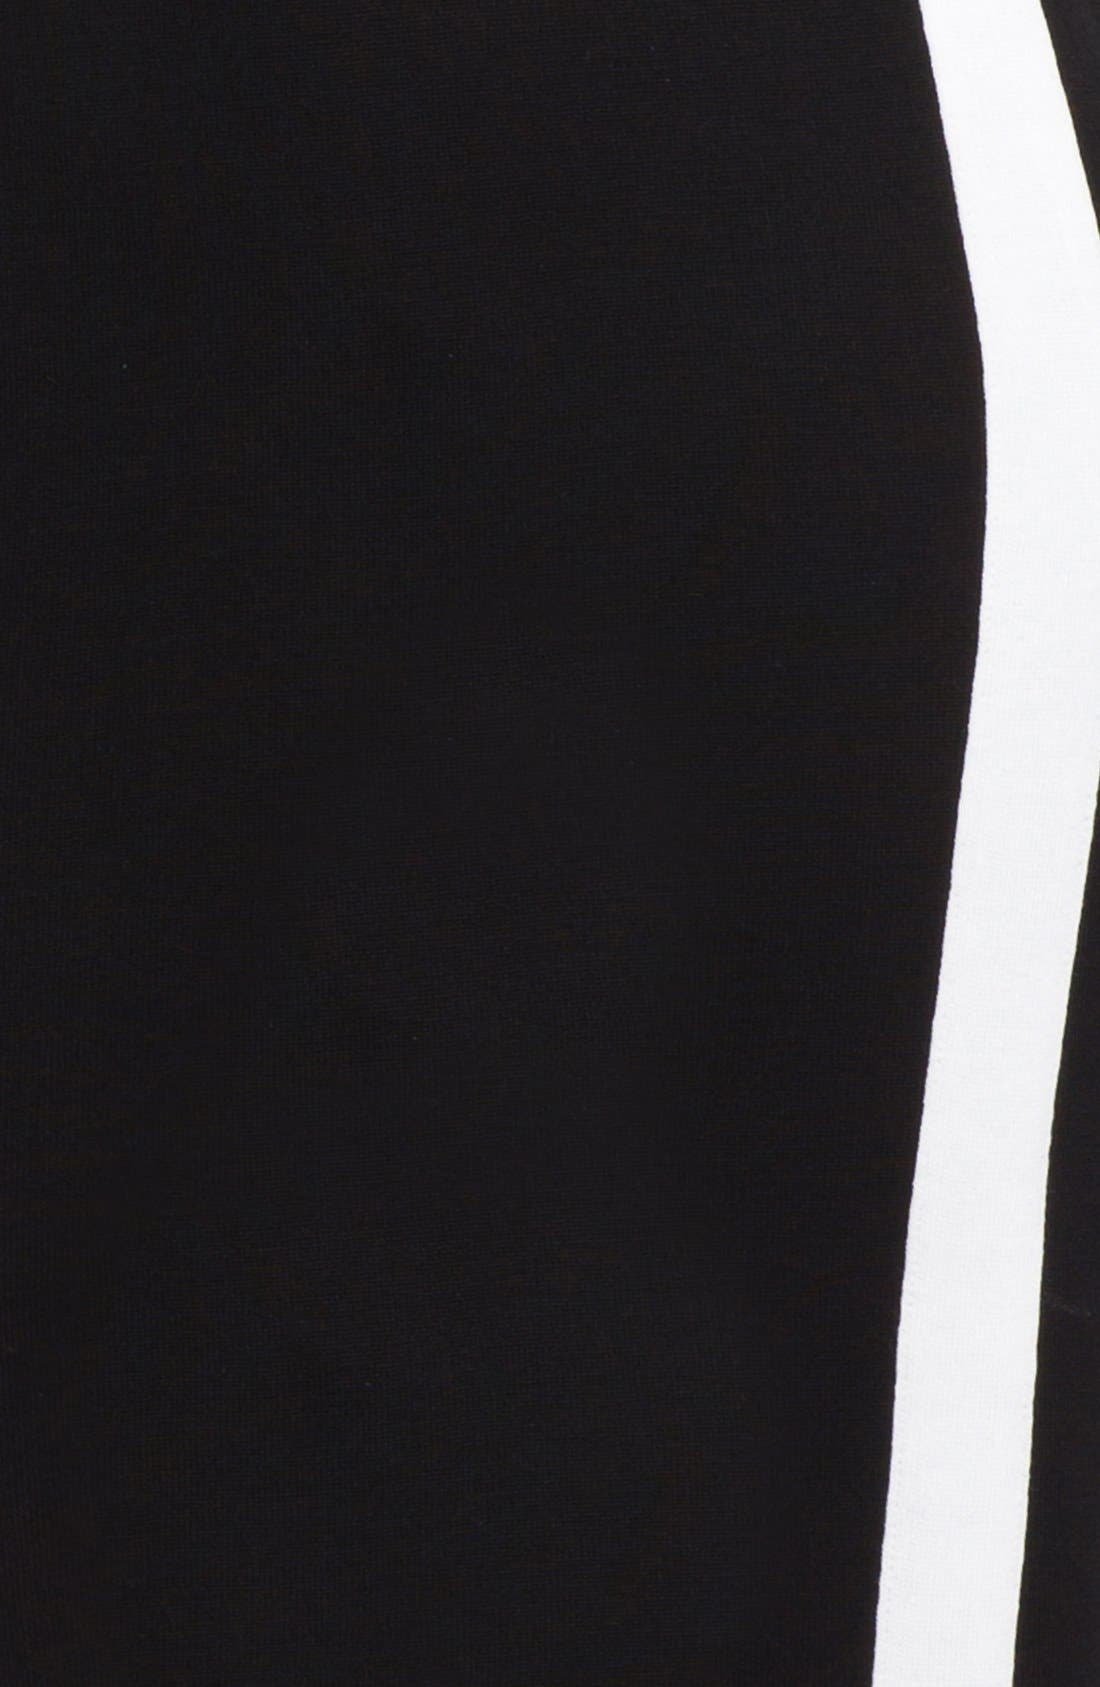 Alternate Image 3  - Misook 'Carrie' Dress (Petite)